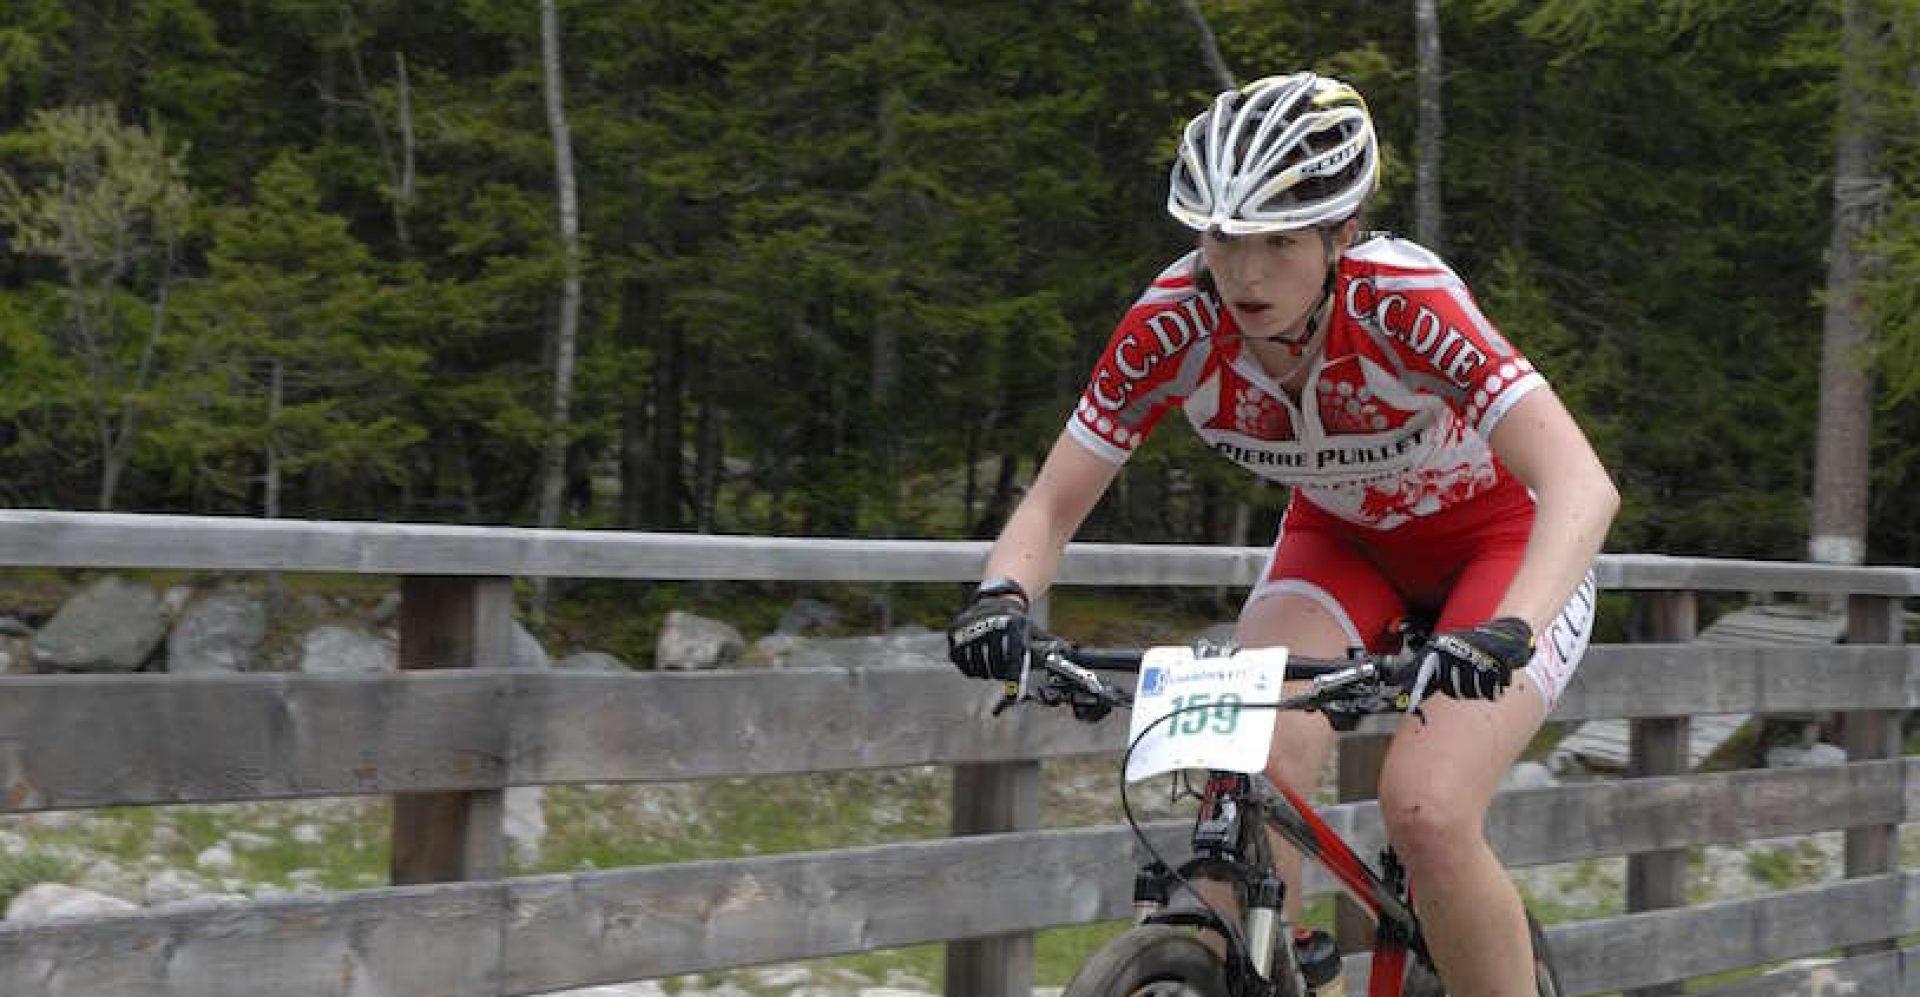 Club Cycliste de Die